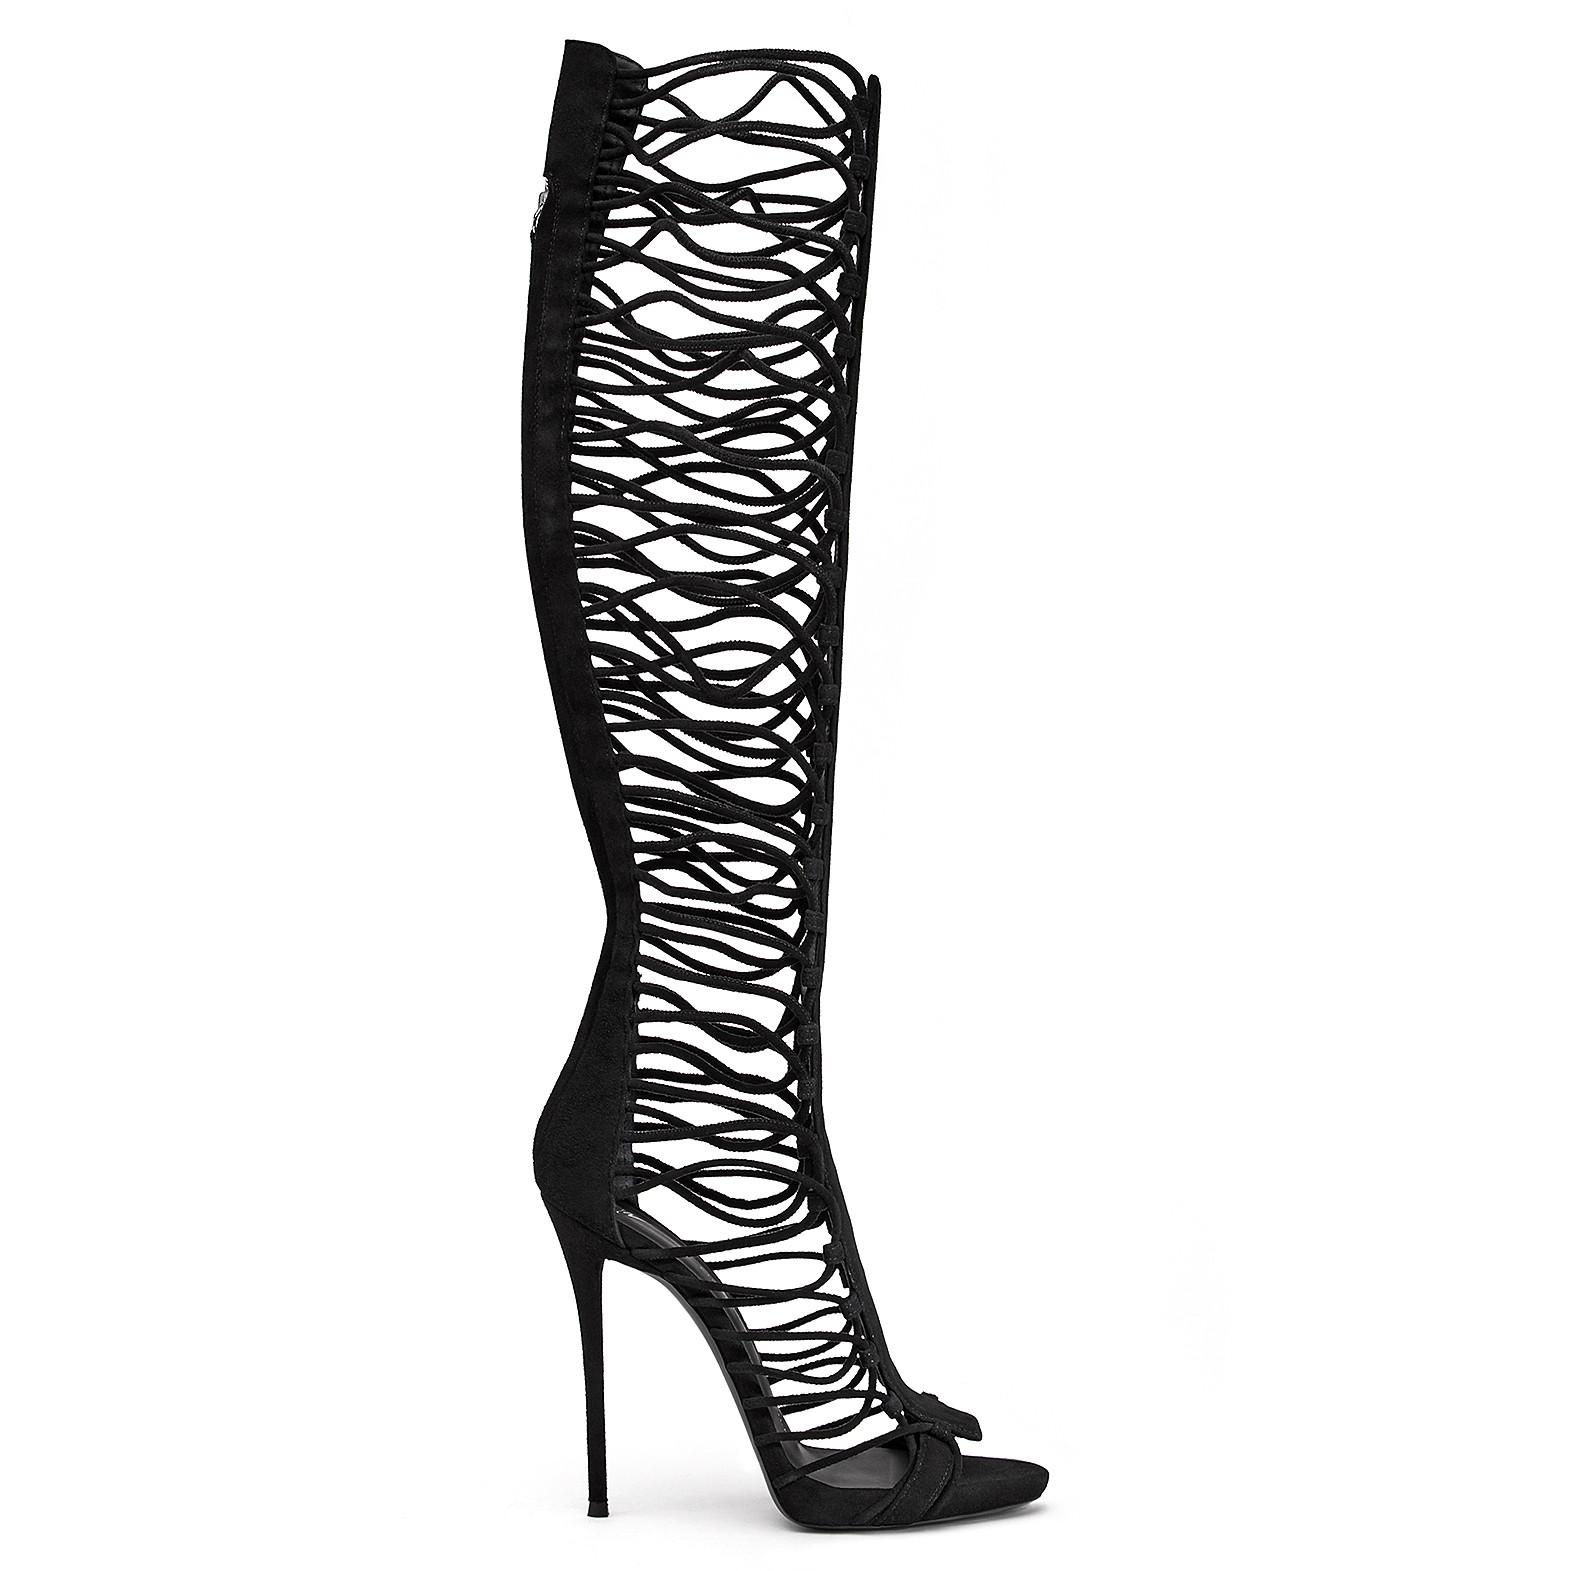 Zoey corded boots by Giuseppe Zanotti